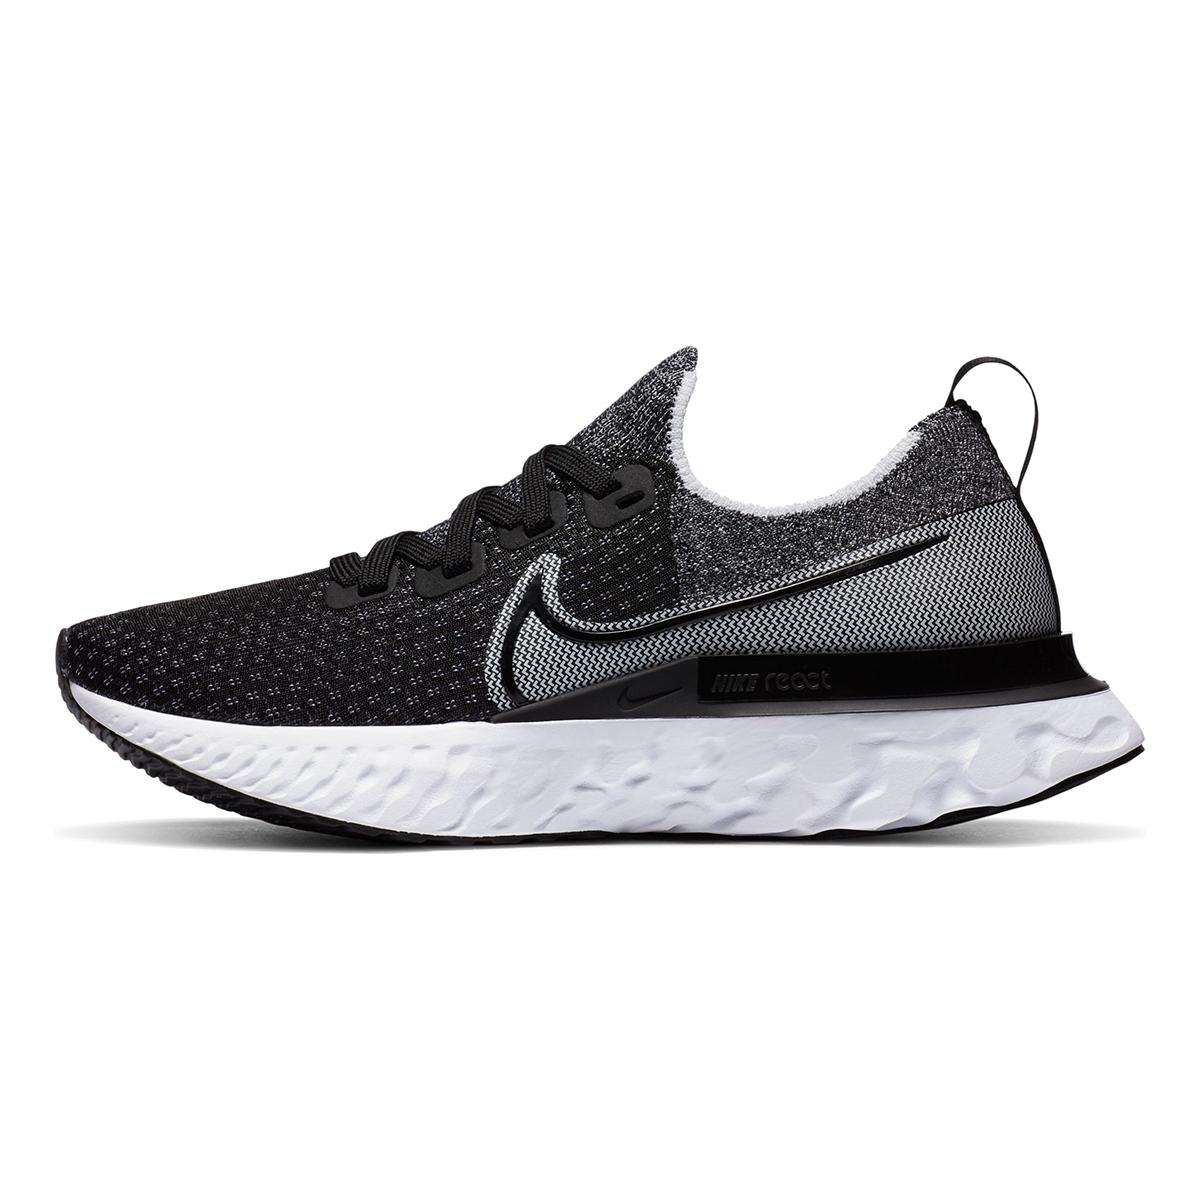 Women's Nike React Infinity Run Flyknit Running Shoe - Color: Black/White/White - Size: 5 - Width: Regular, Black/White/White, large, image 3